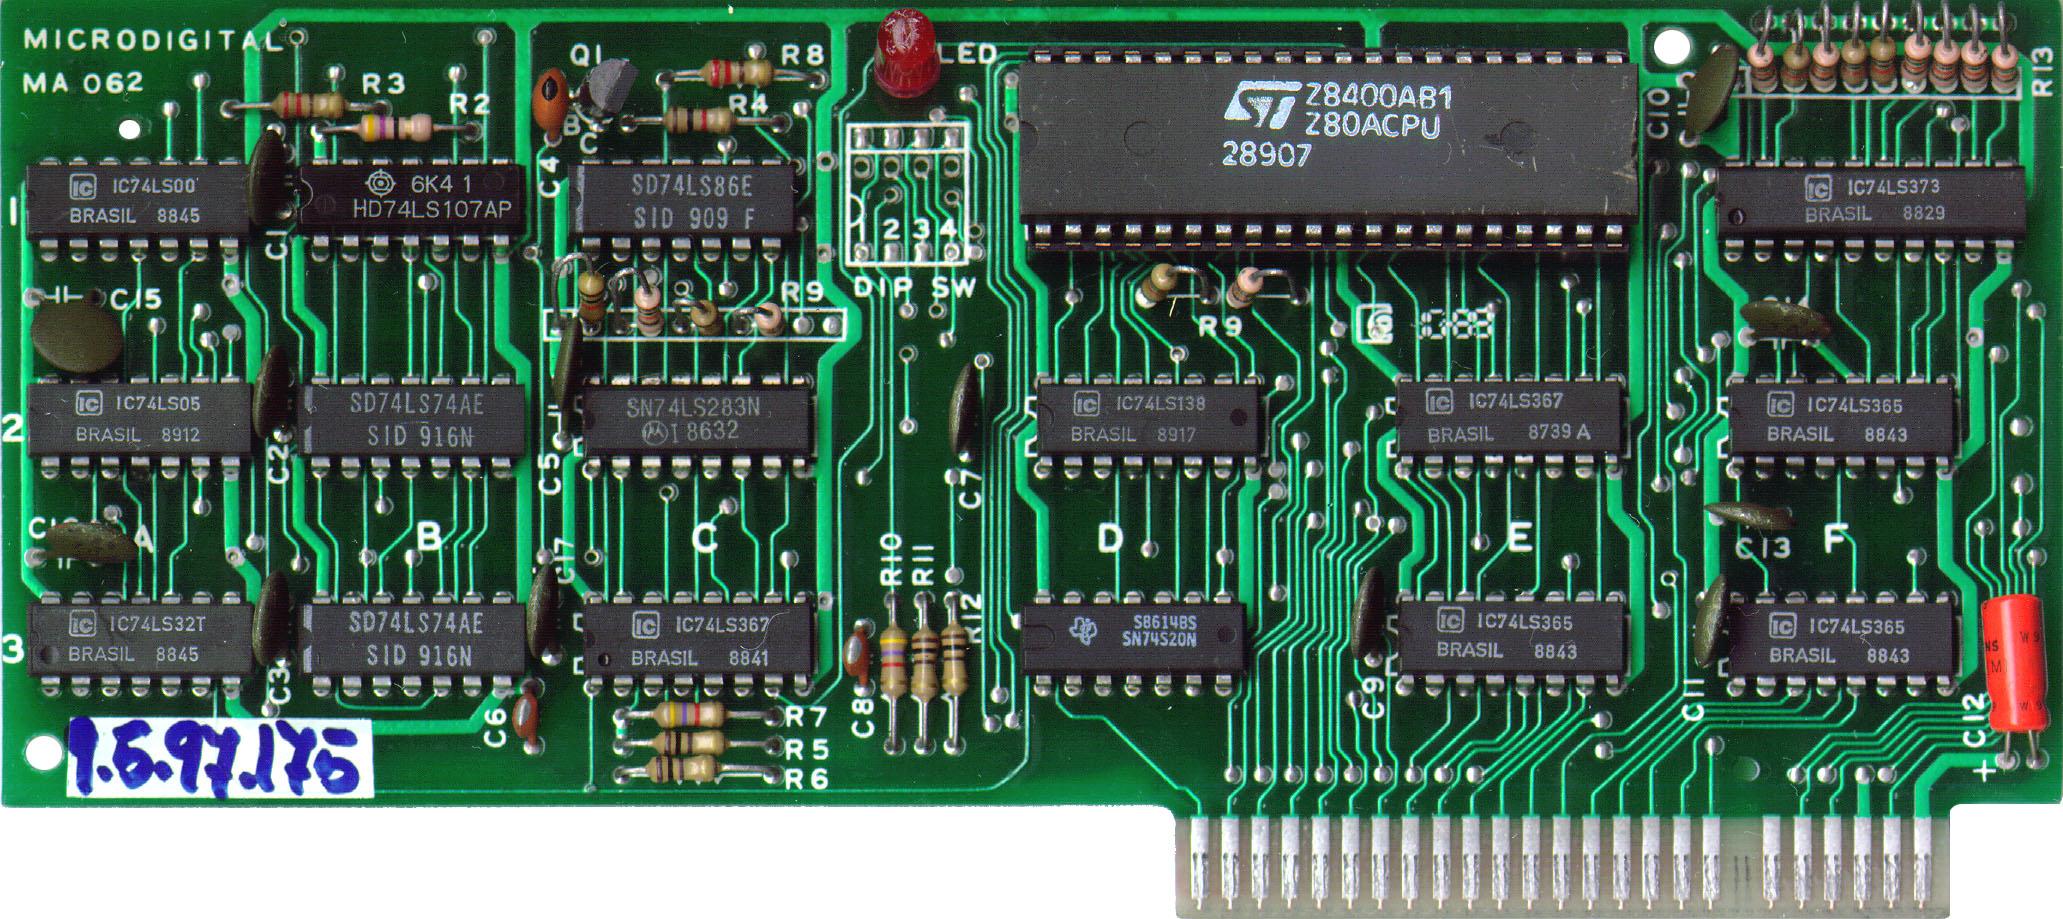 File:Microdigital Super Z80 Card jpg - Wikimedia Commons